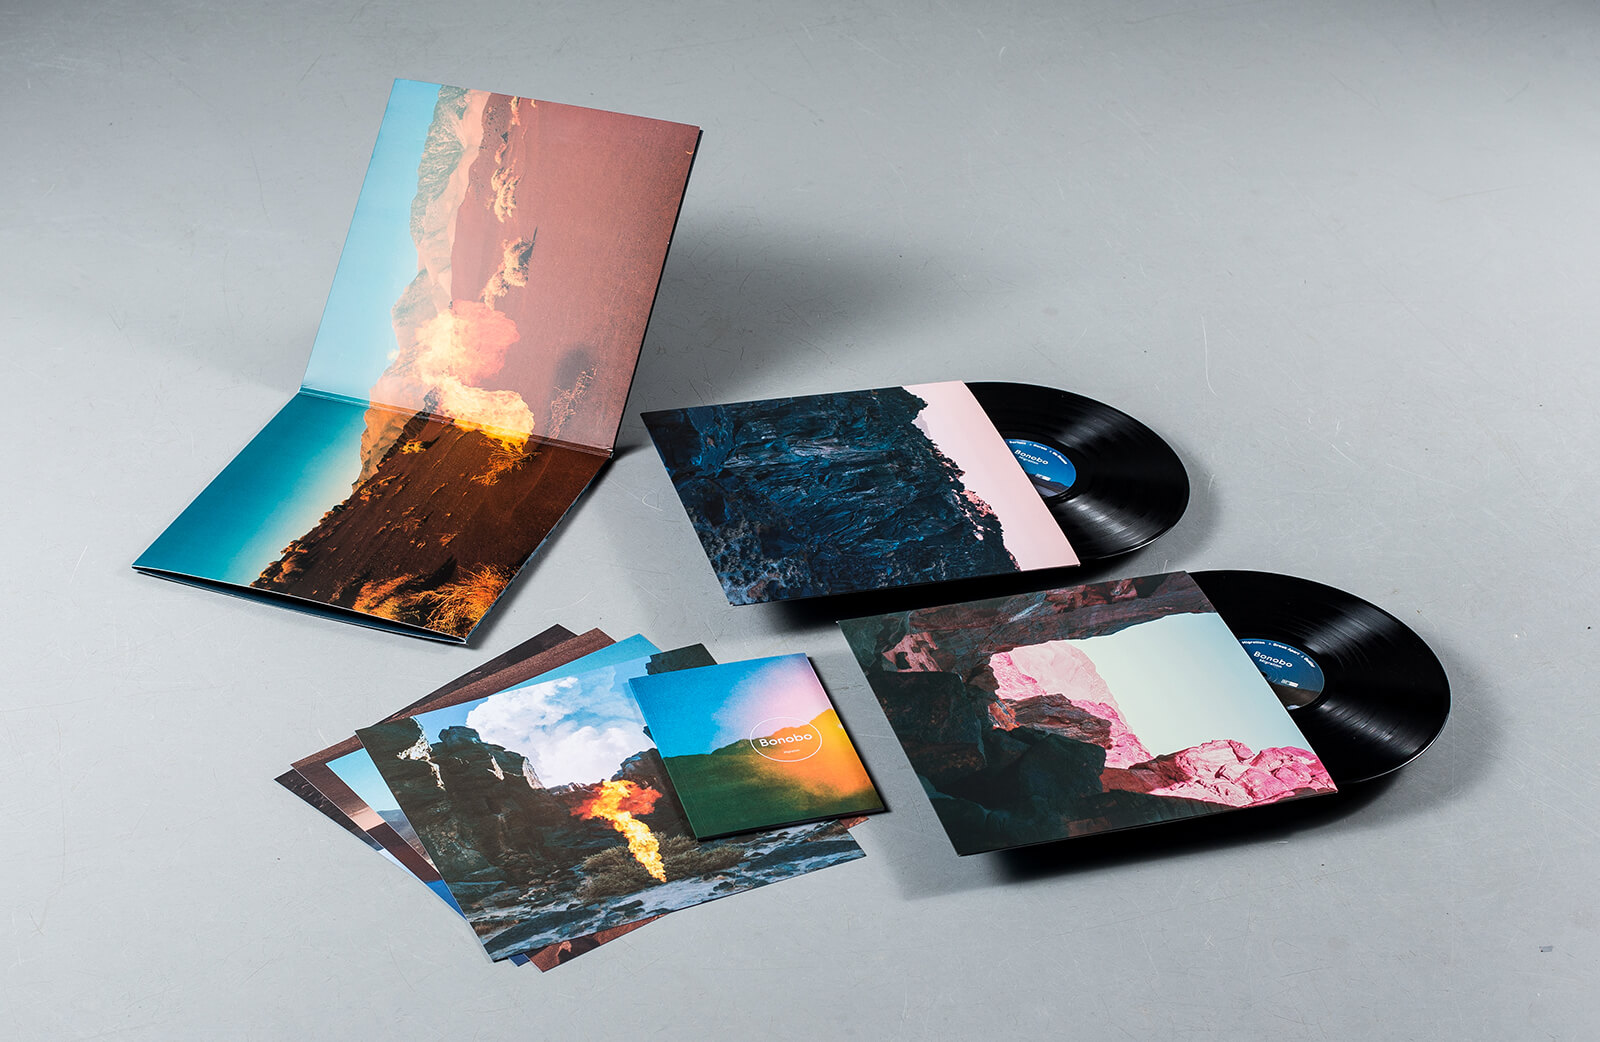 bonobo-migration-vinyl-edition_0006_at8w0044